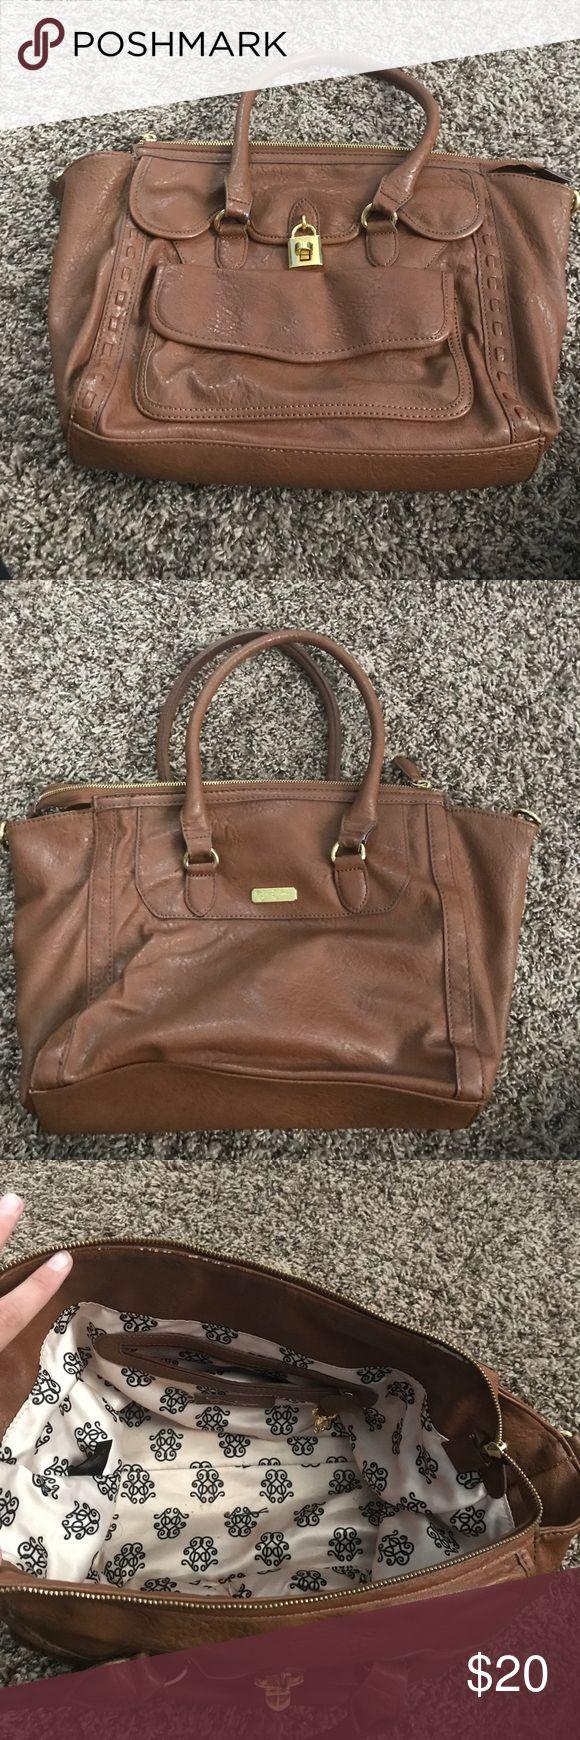 Jessica Simpson purse Gently used Jessica Simpson purse. Little bit of wear and tear on inside under zipper. Multiple pockets. Jessica Simpson Bags Satchels